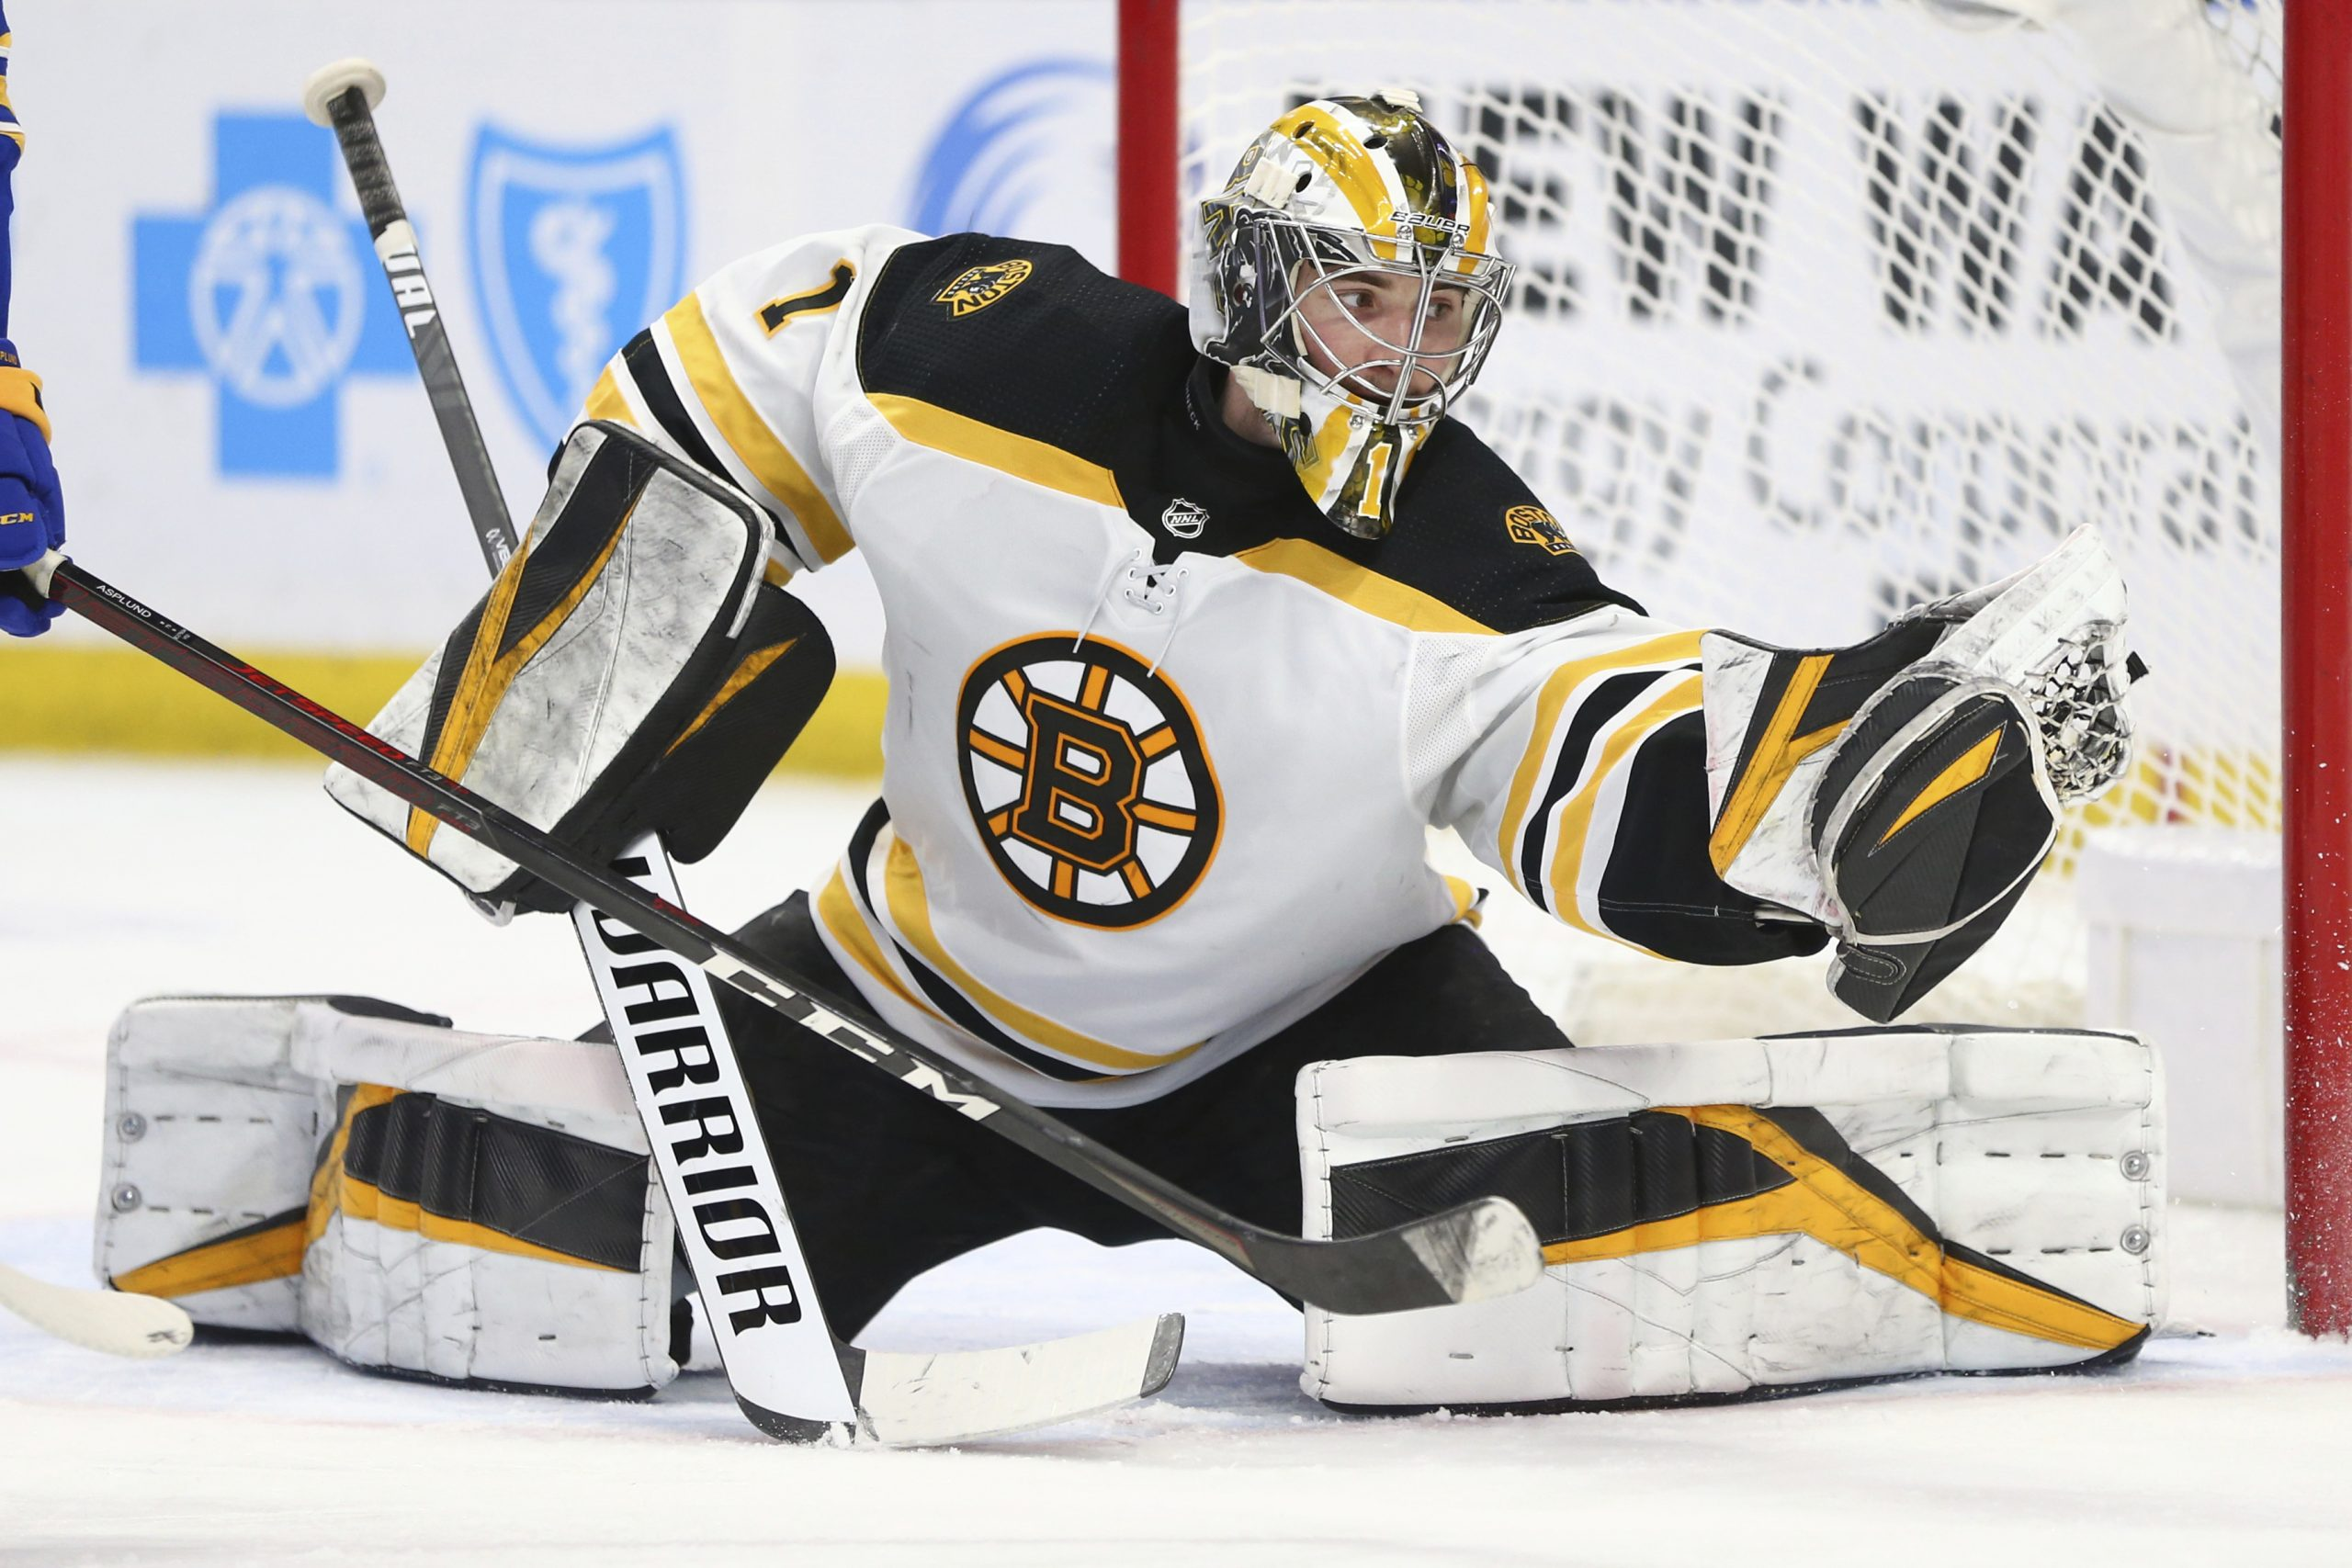 Jeremy Swayman makes 29 saves as Bruins beat Sabres again